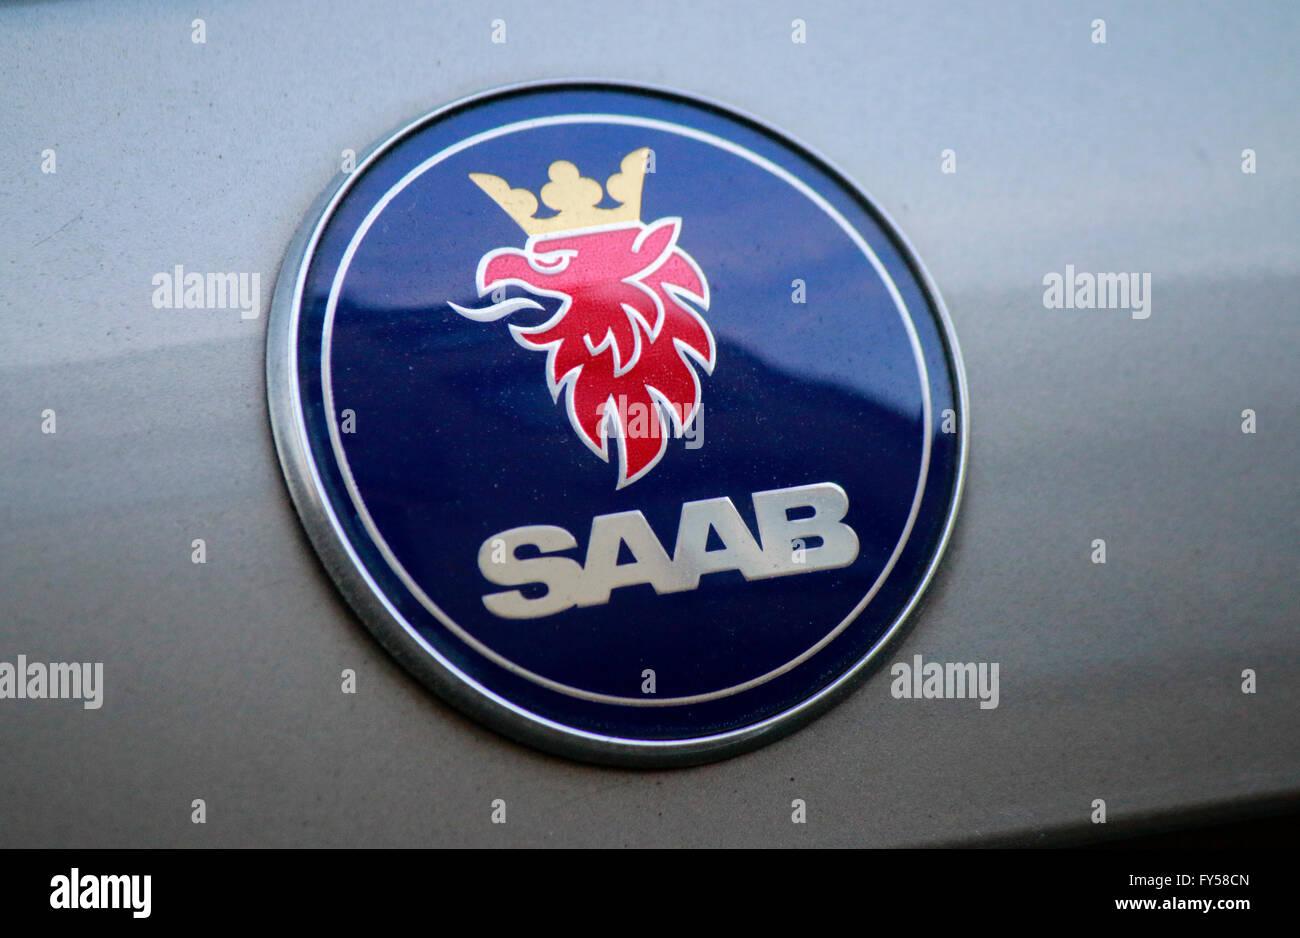 Markennamen: 'Saab', Berlin. - Stock Image